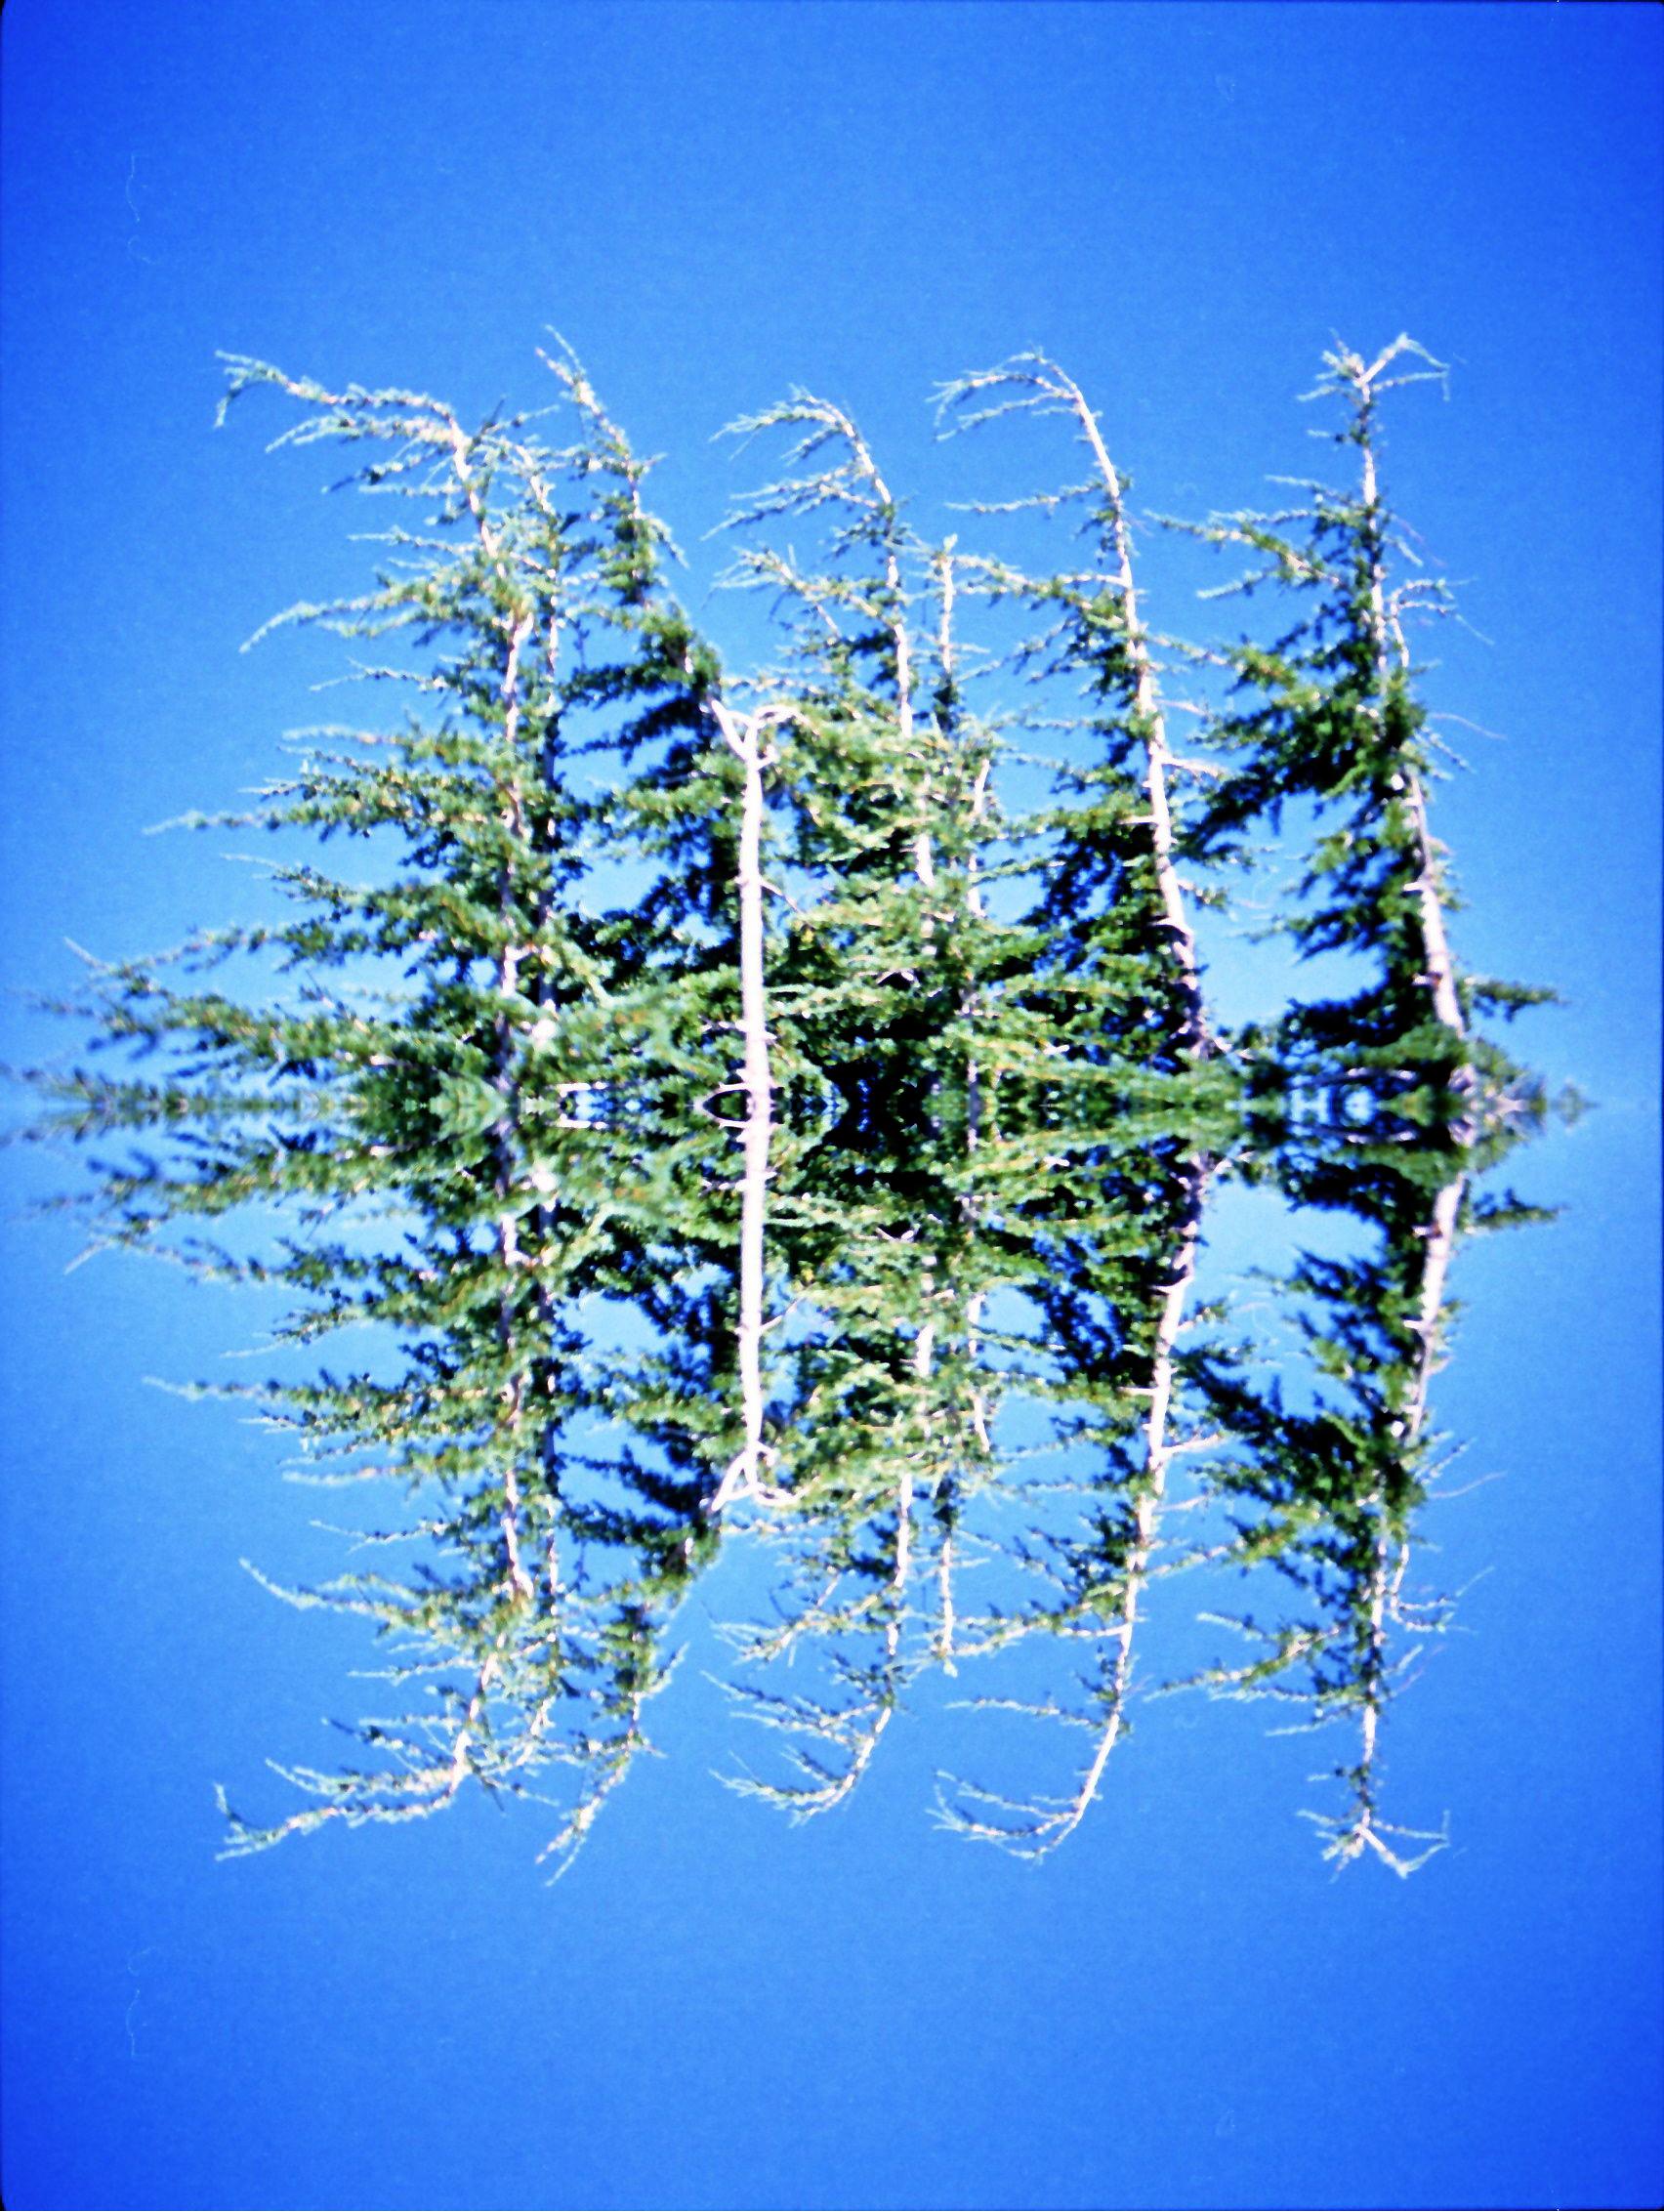 trees copy.jpg